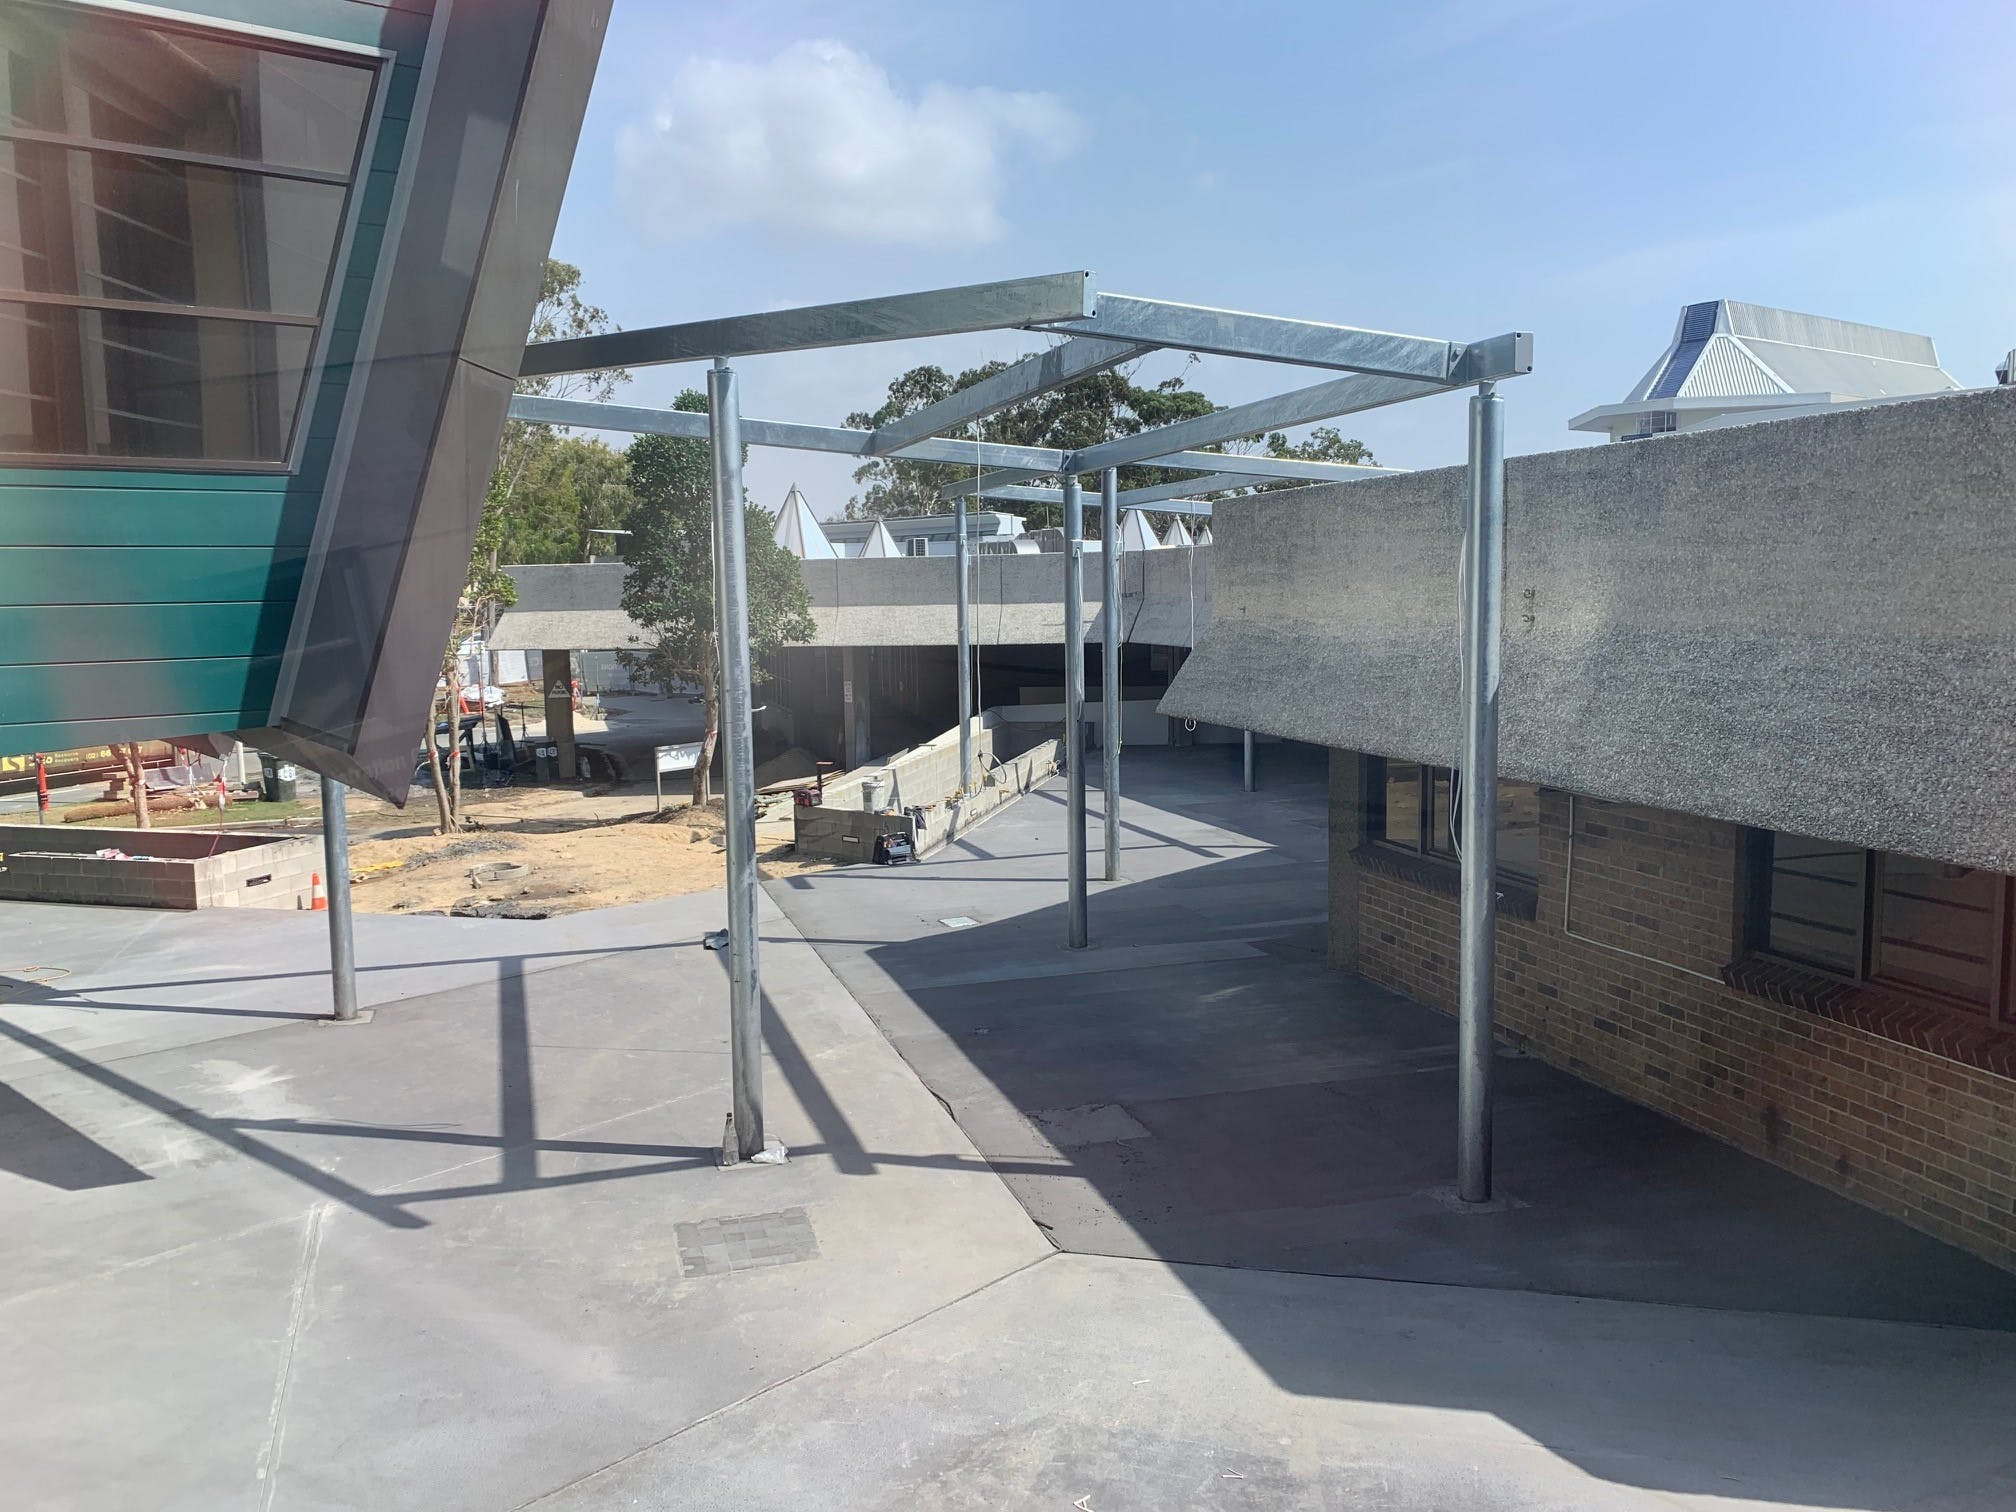 Tweed Heads Civic Centre redevelopment